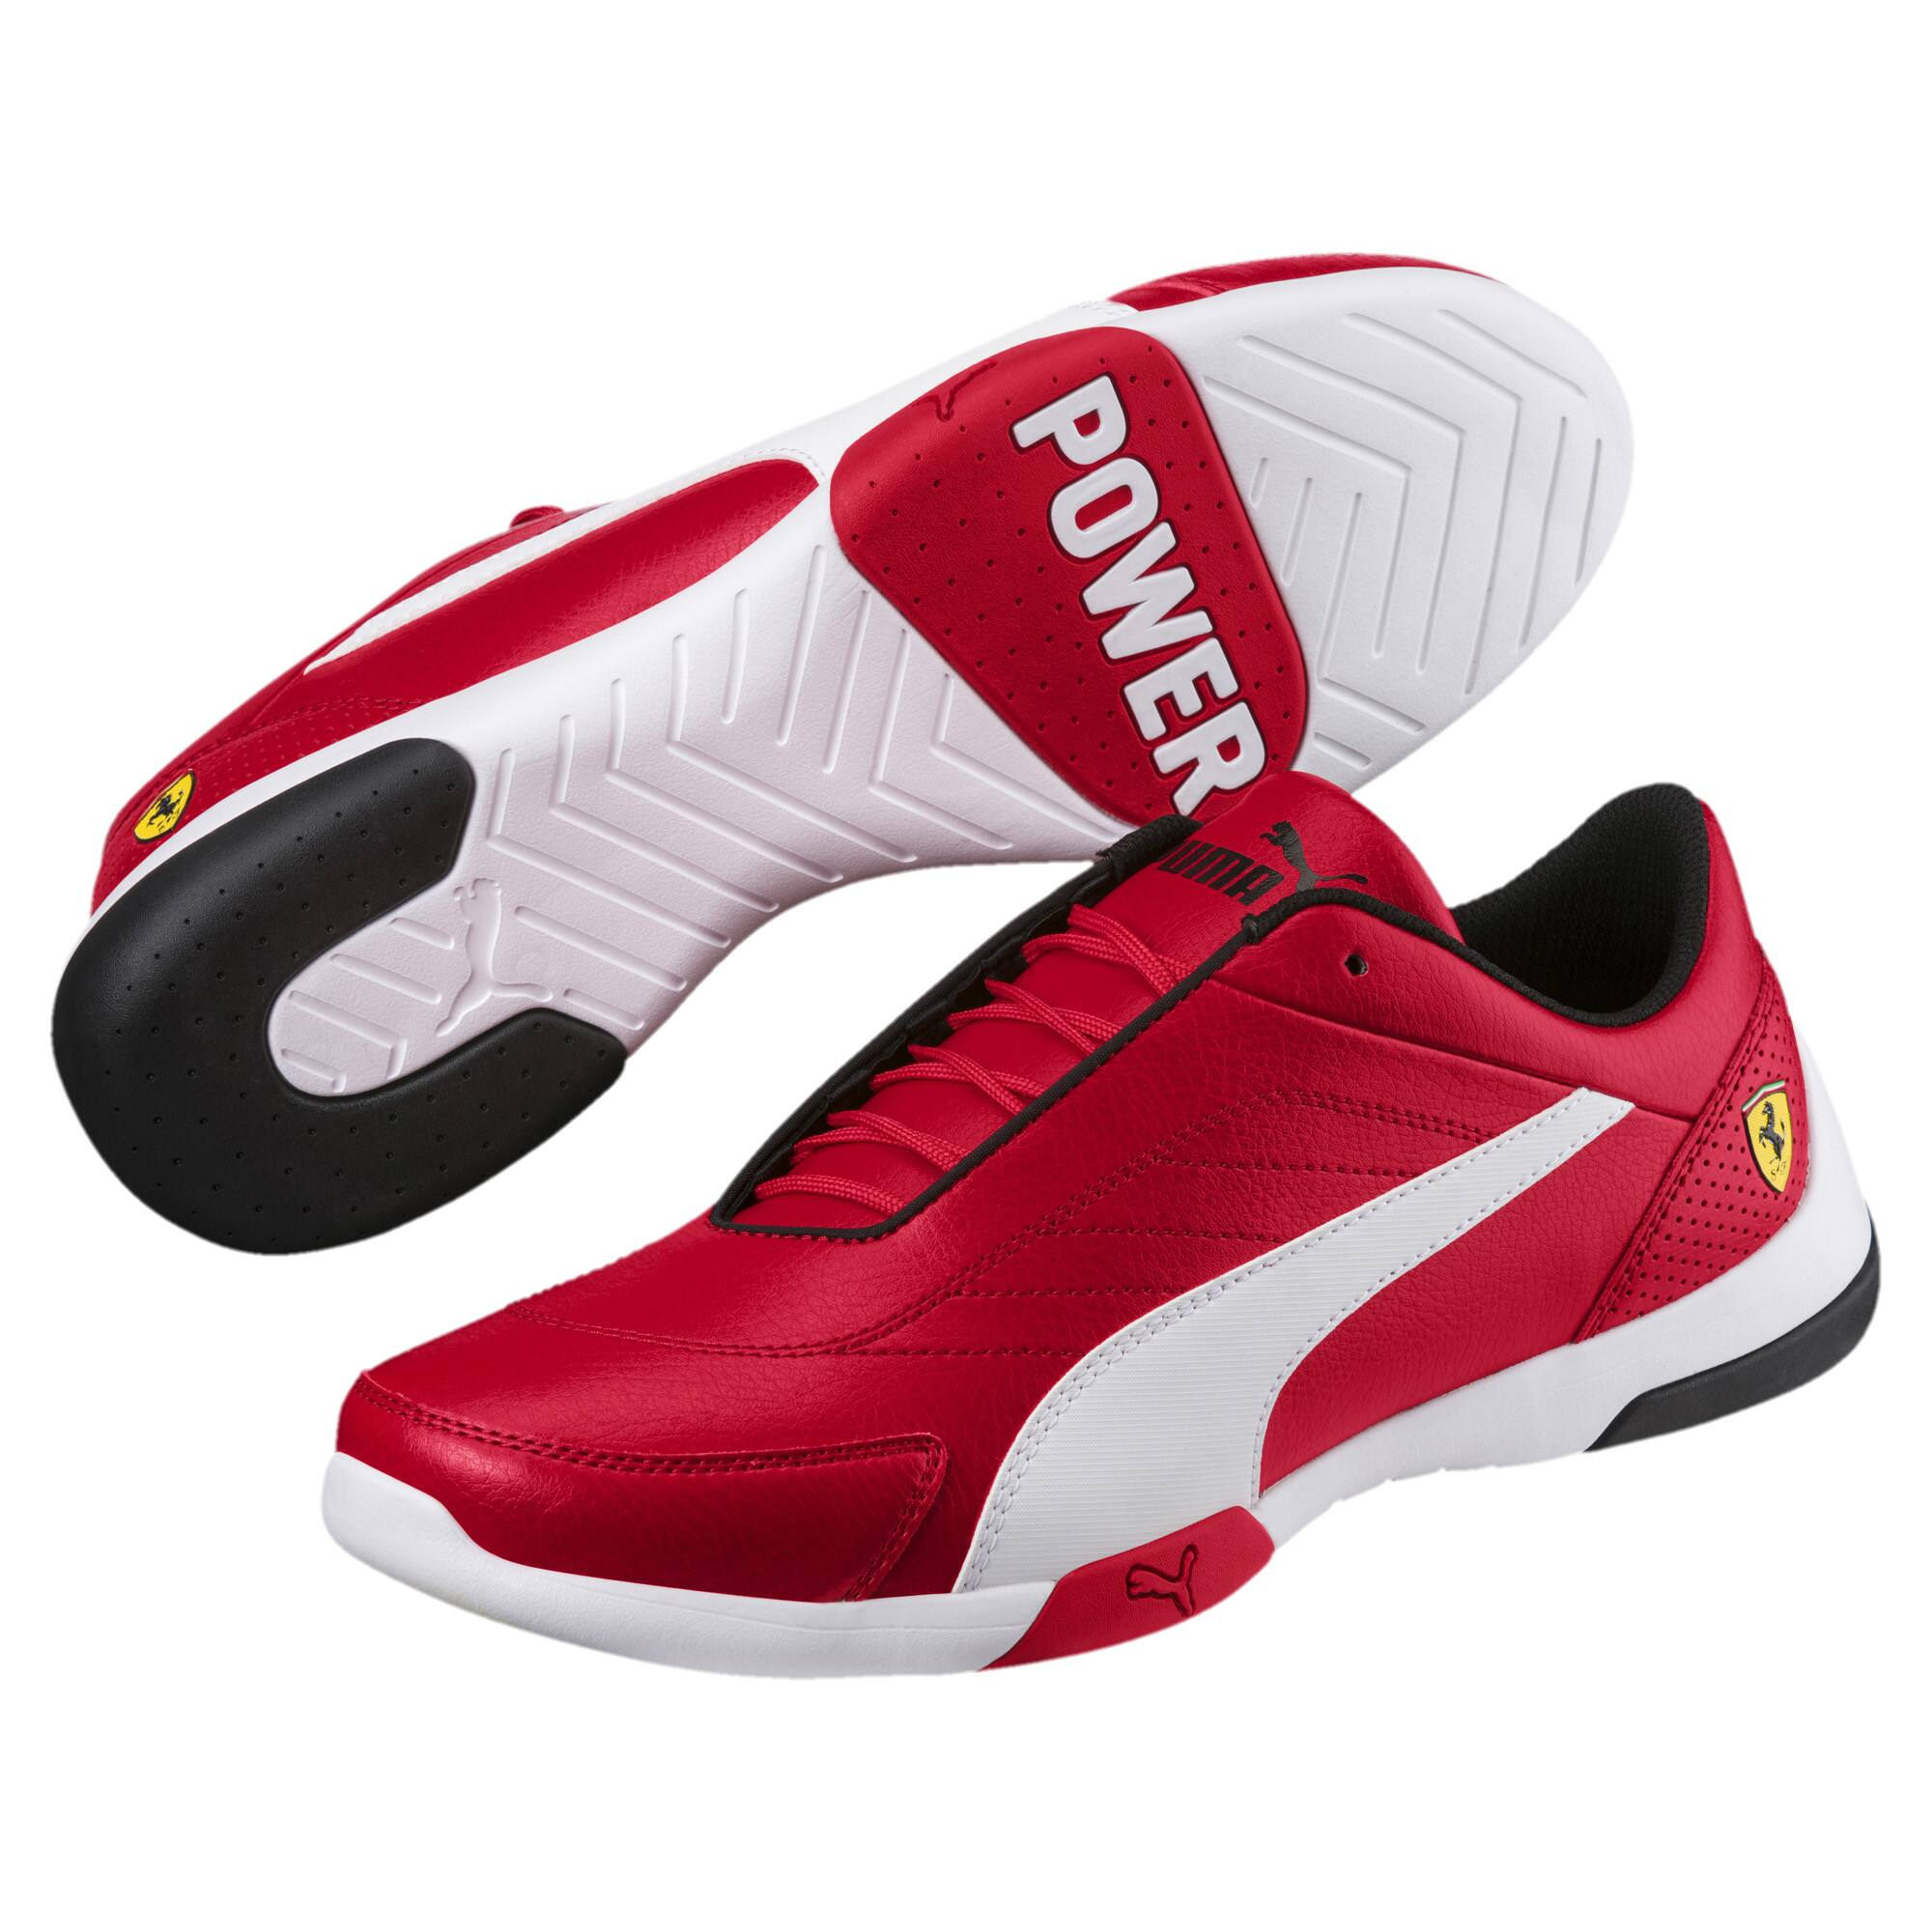 36ad5c7fd91a80 PUMA Ferrari Kart Cat III Sneakers Men Shoe Auto  34.99 Ebay  34.98 ...